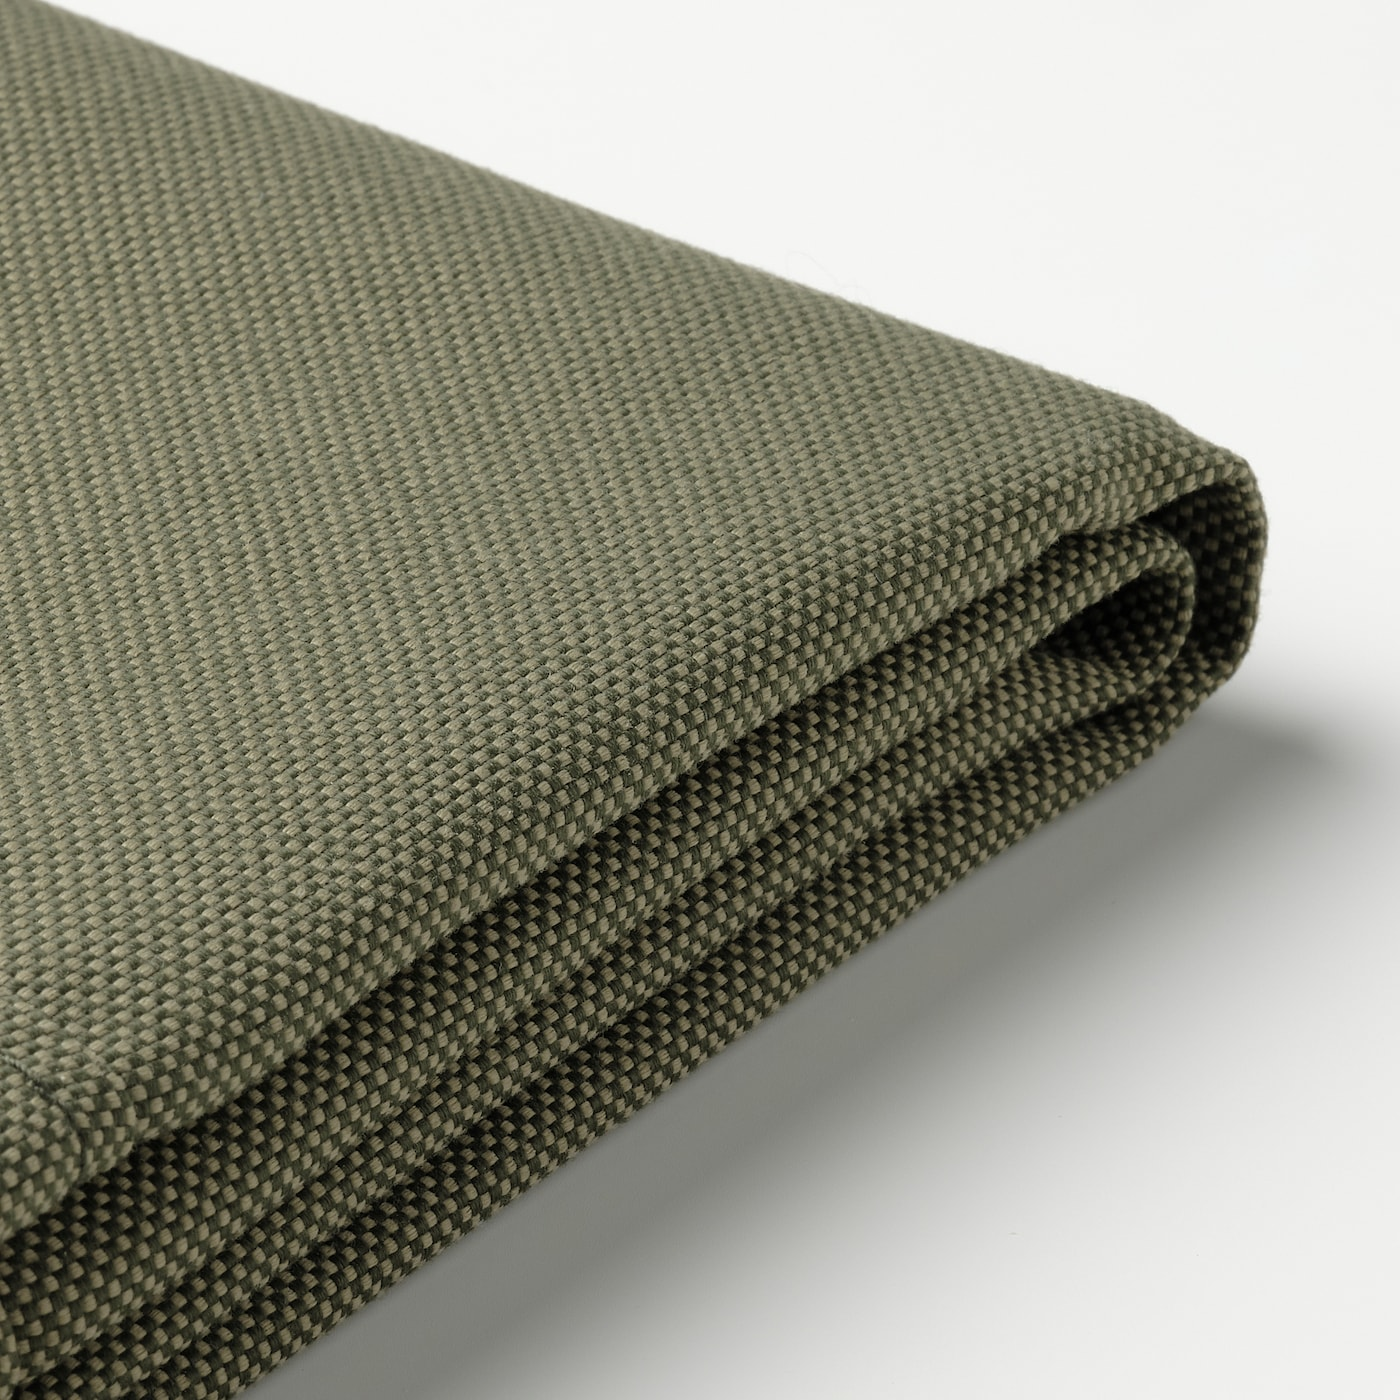 FRÖSÖN Cover for back cushion, outdoor/dark beige-green, 62x44 cm